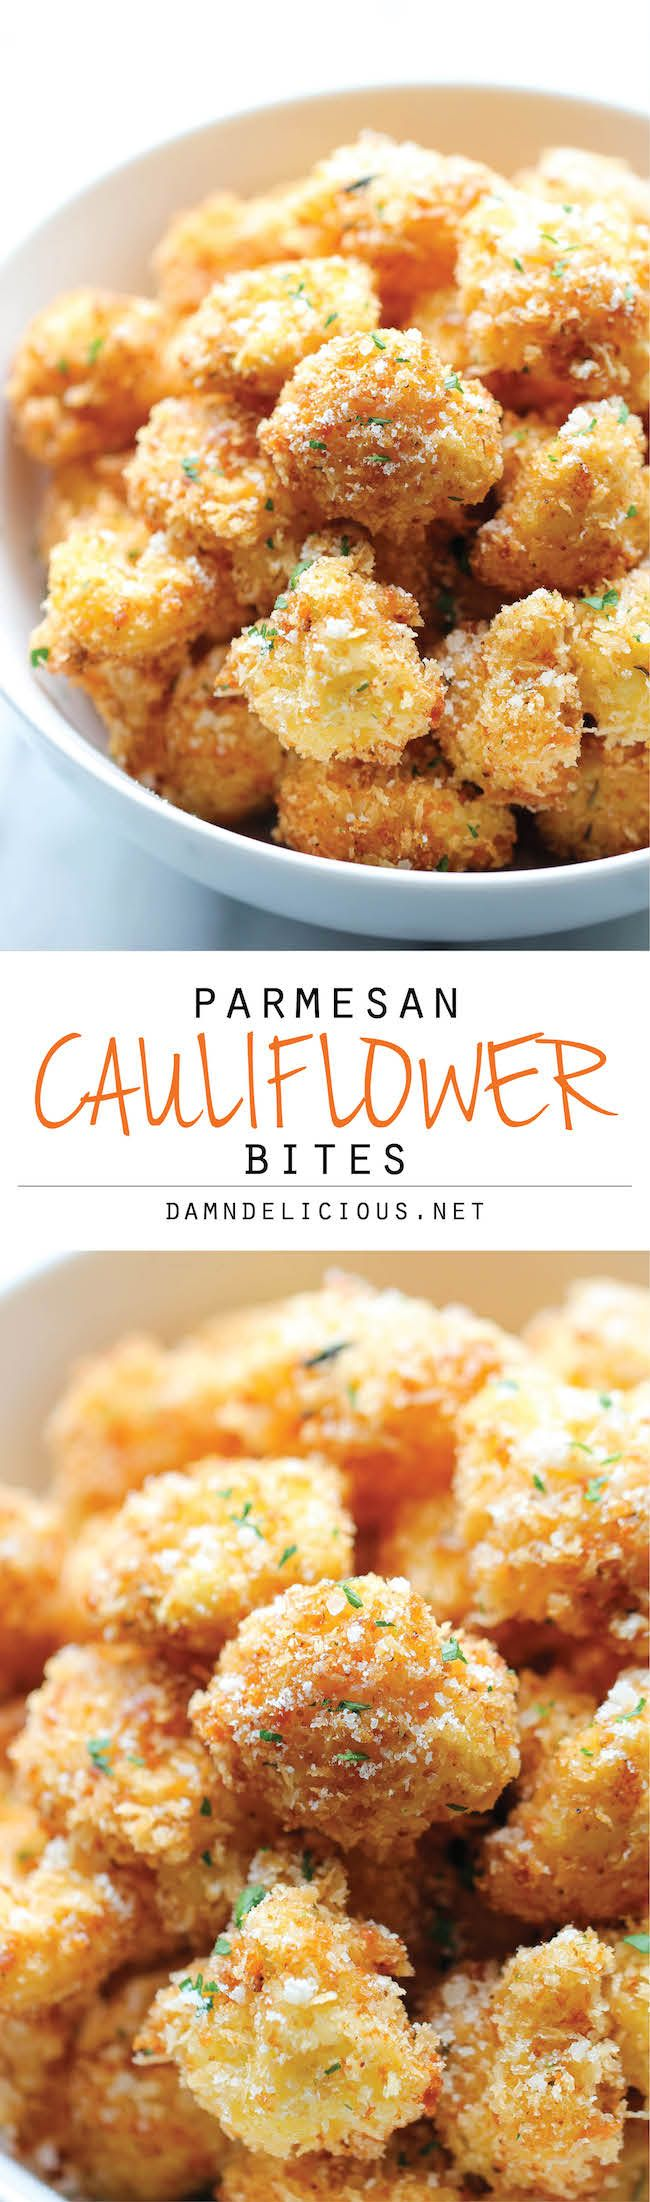 Parmesan Cauliflower Bites – Crisp, crunchy cauliflower bites that even the pick